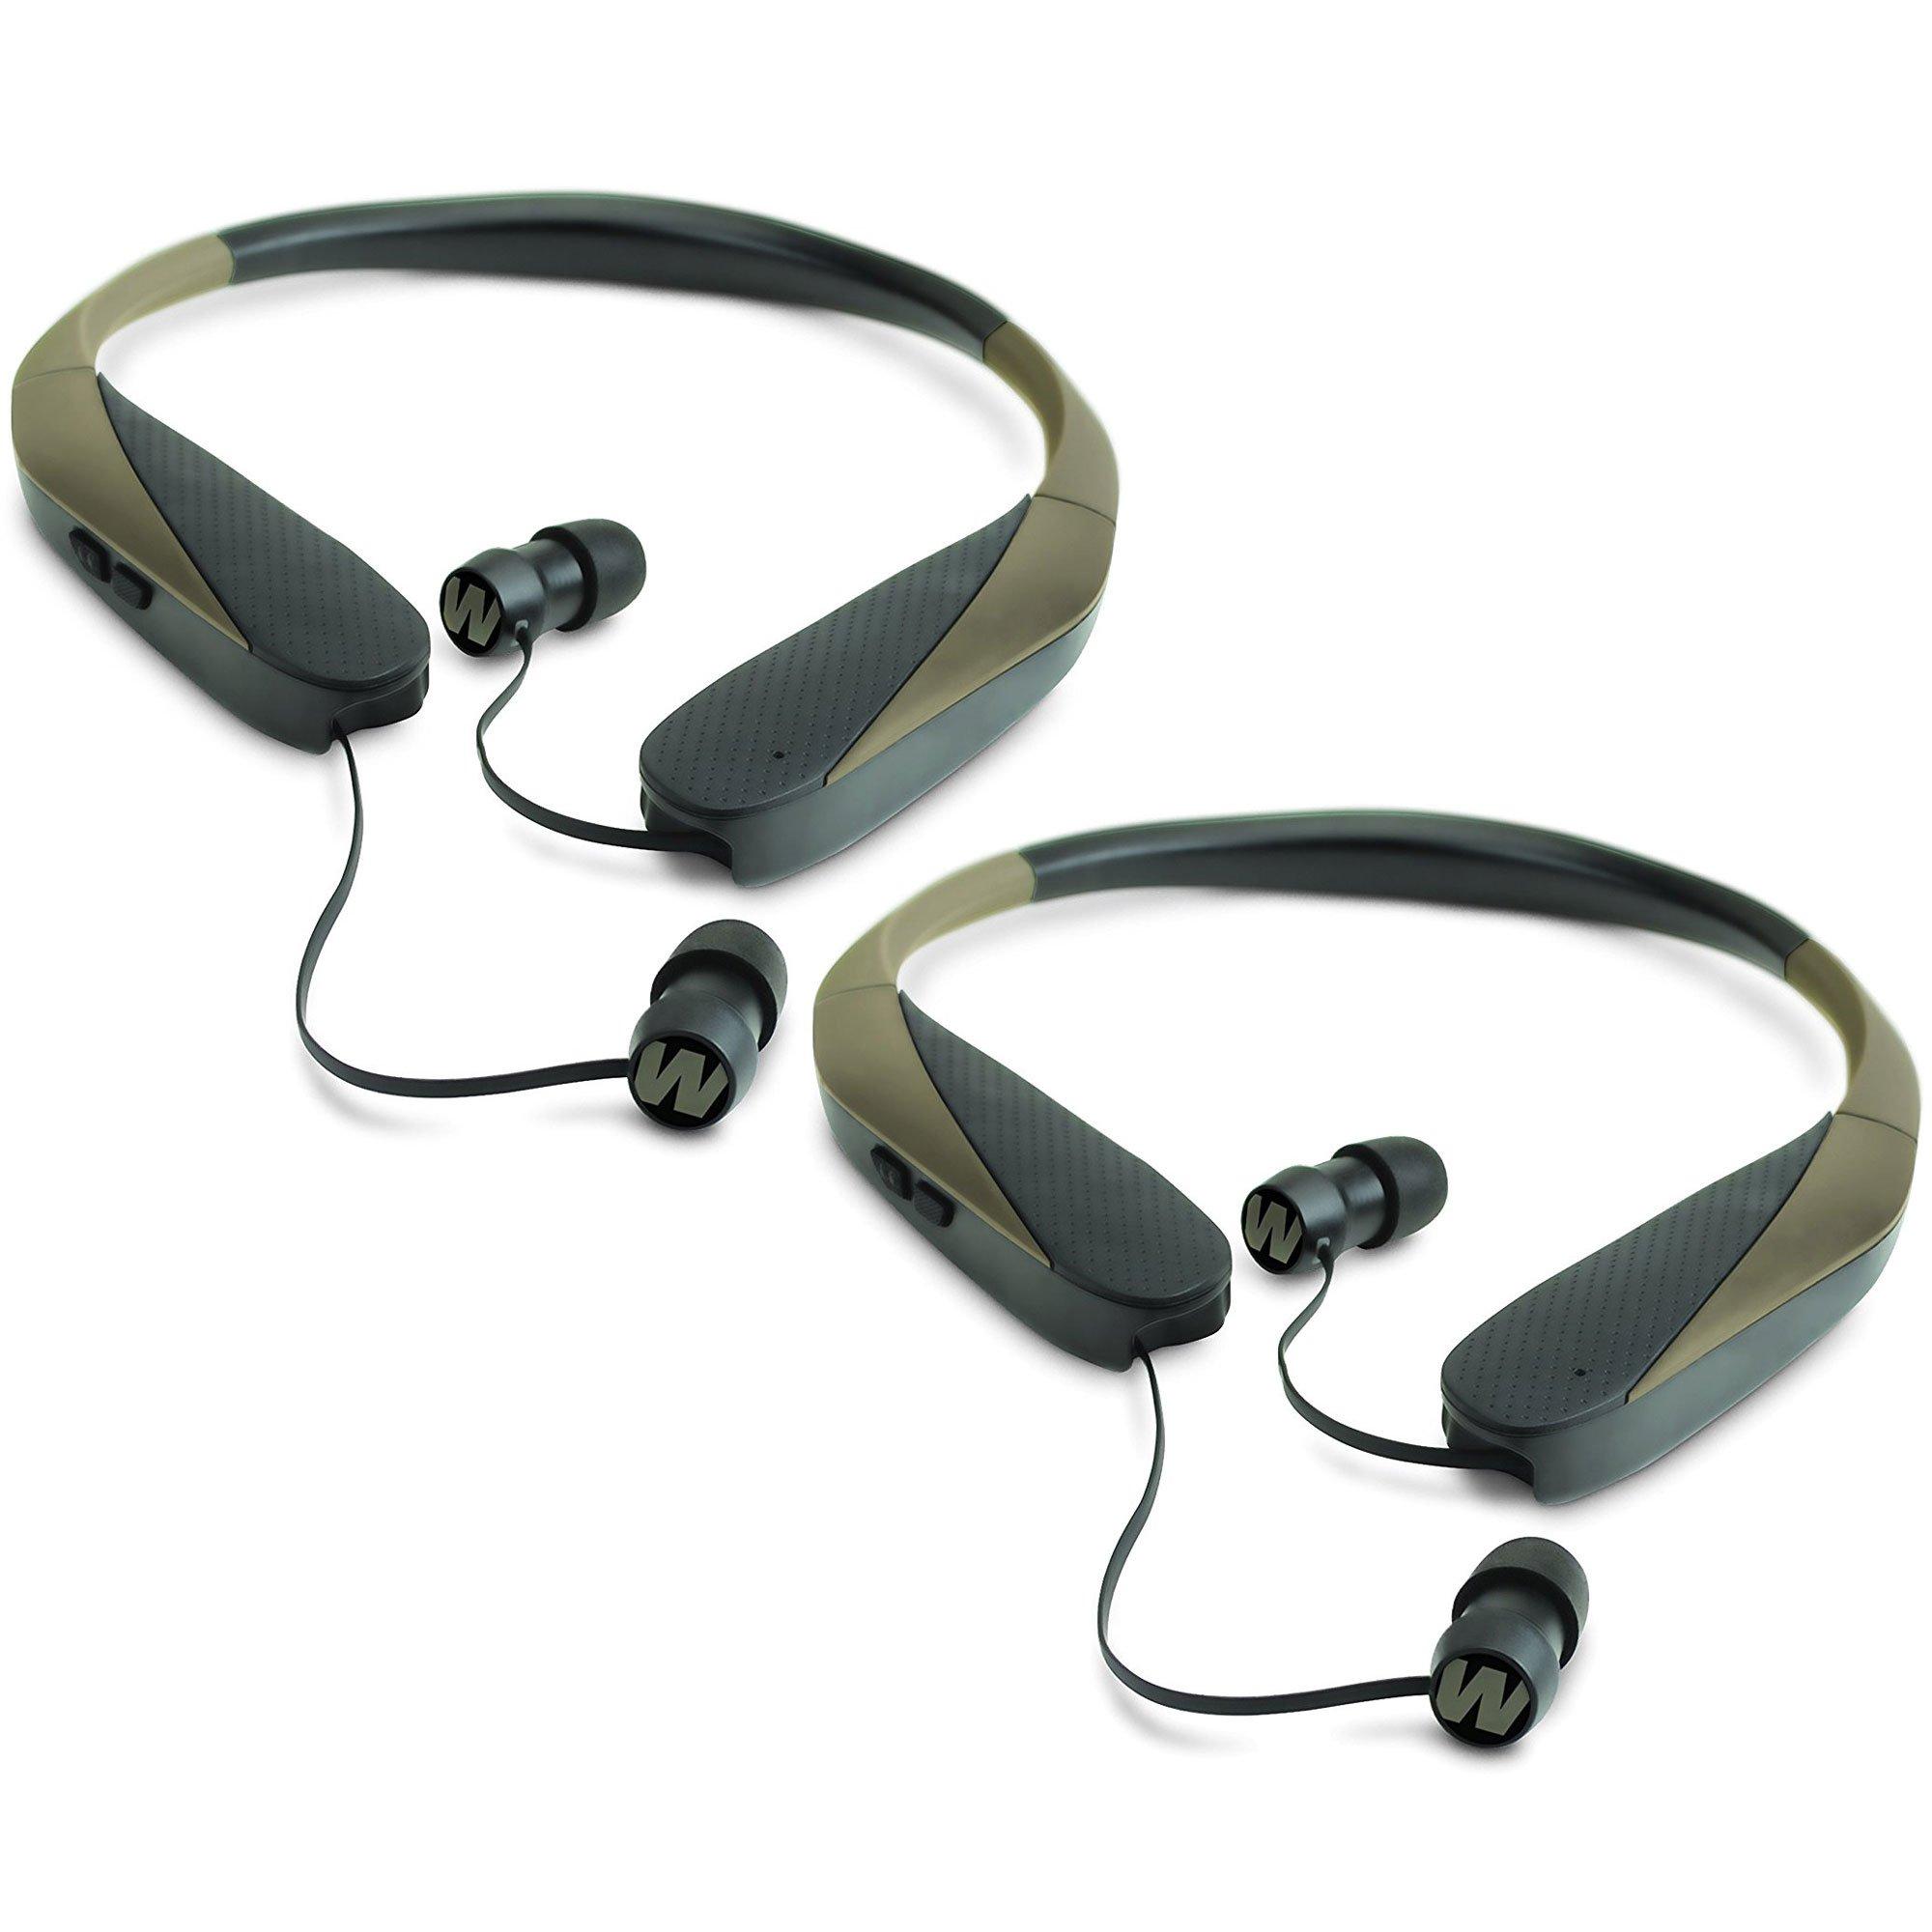 Walker Razor X Retractable Hunting Digital Noise Reduce Ear Bud Headset (2 Pack) by Walker's Game Ear